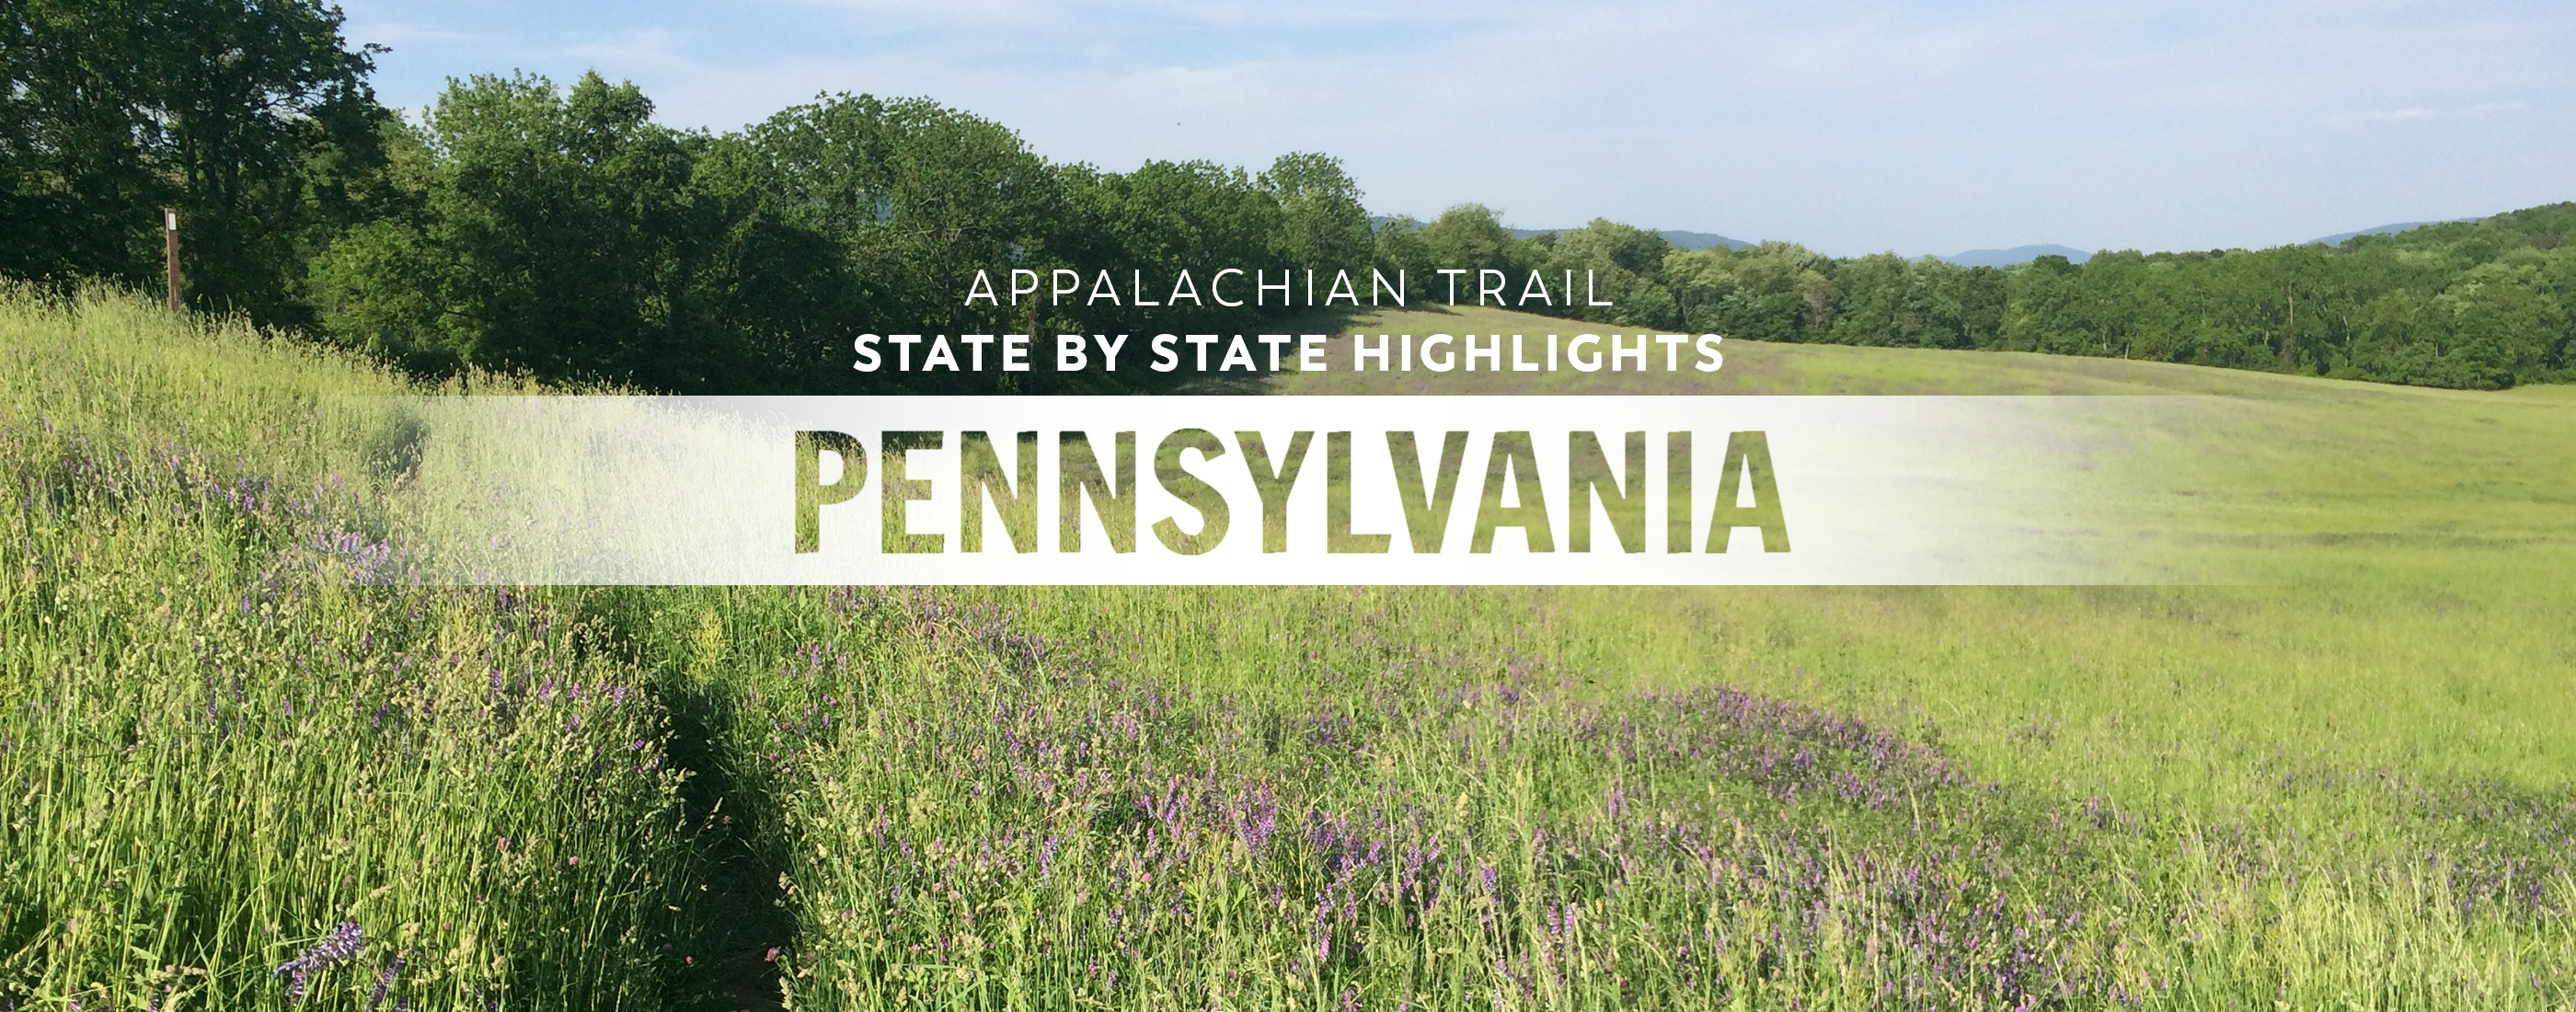 Appalachian Trail State Profile: Pennsylvania - The Trek